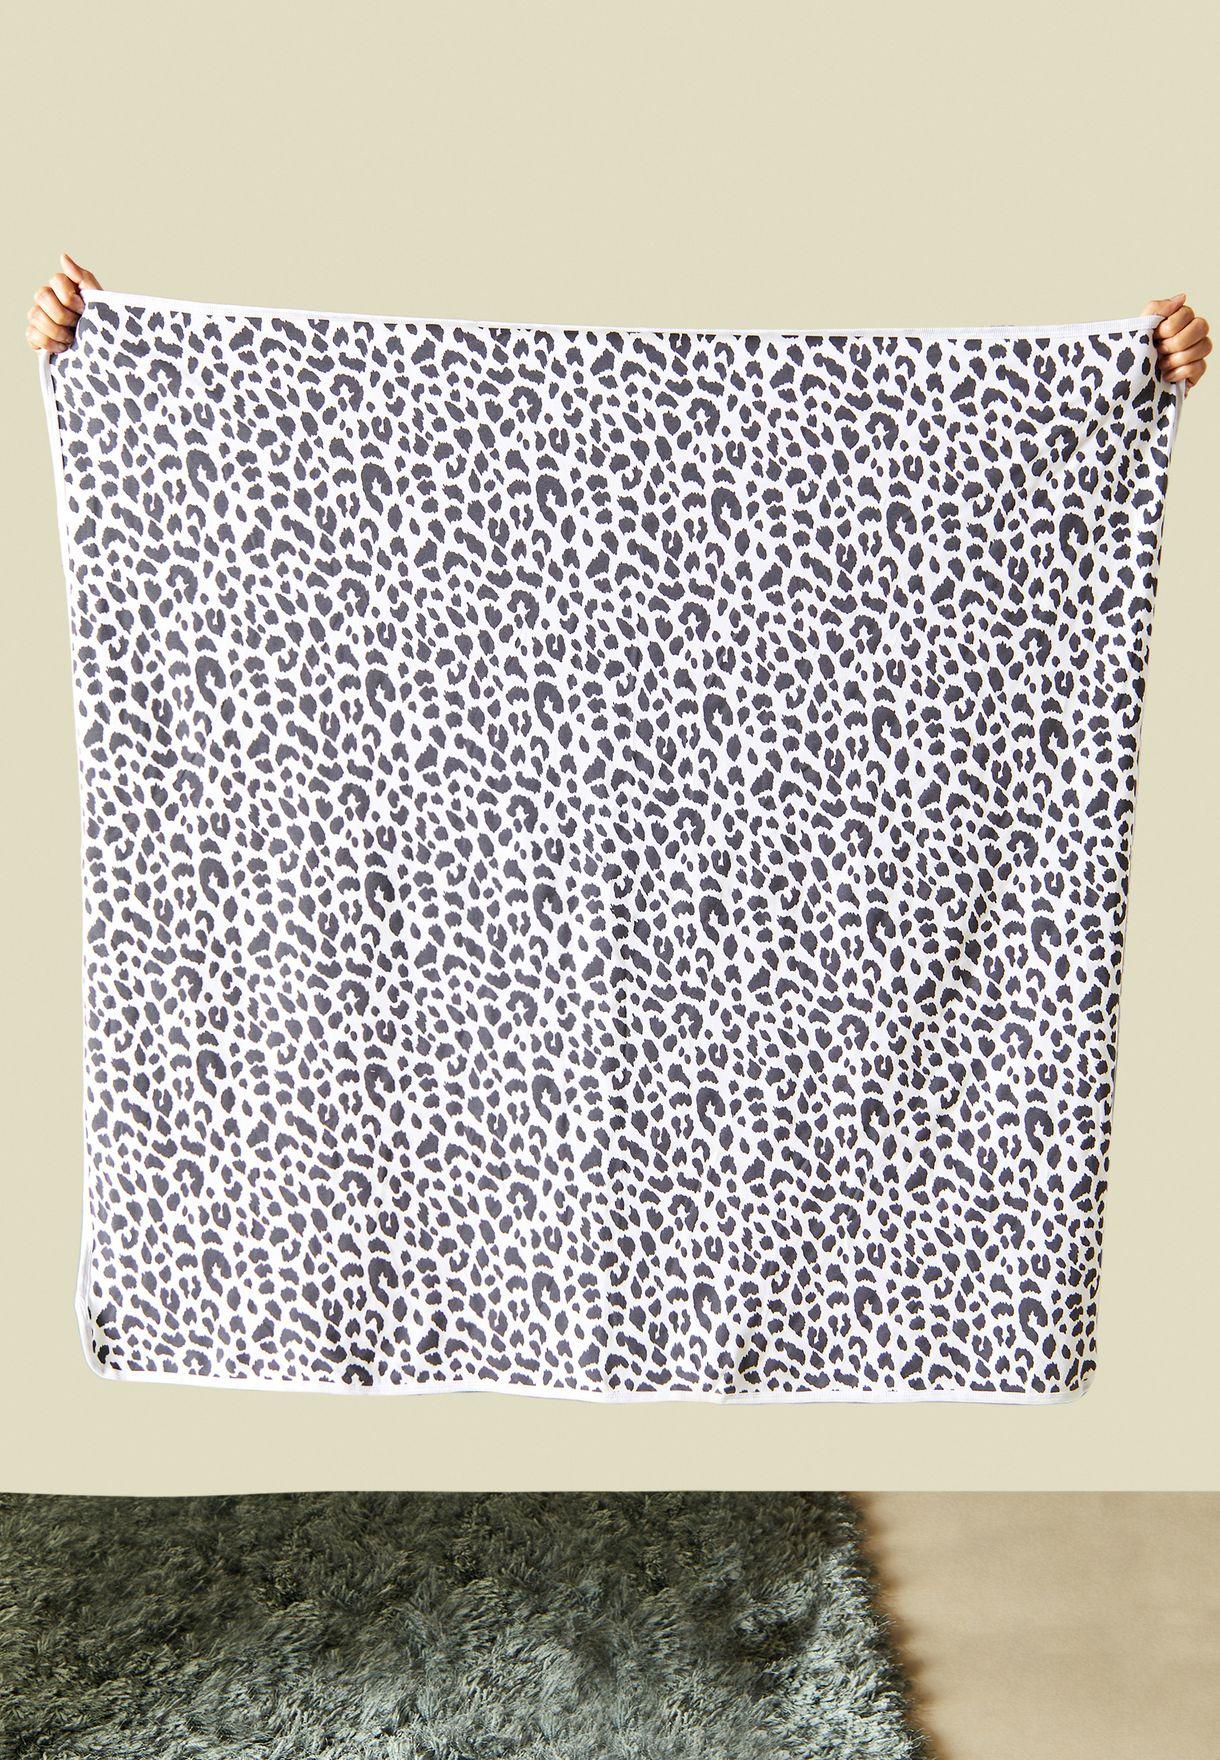 Kids Ocelot Printed Blanket